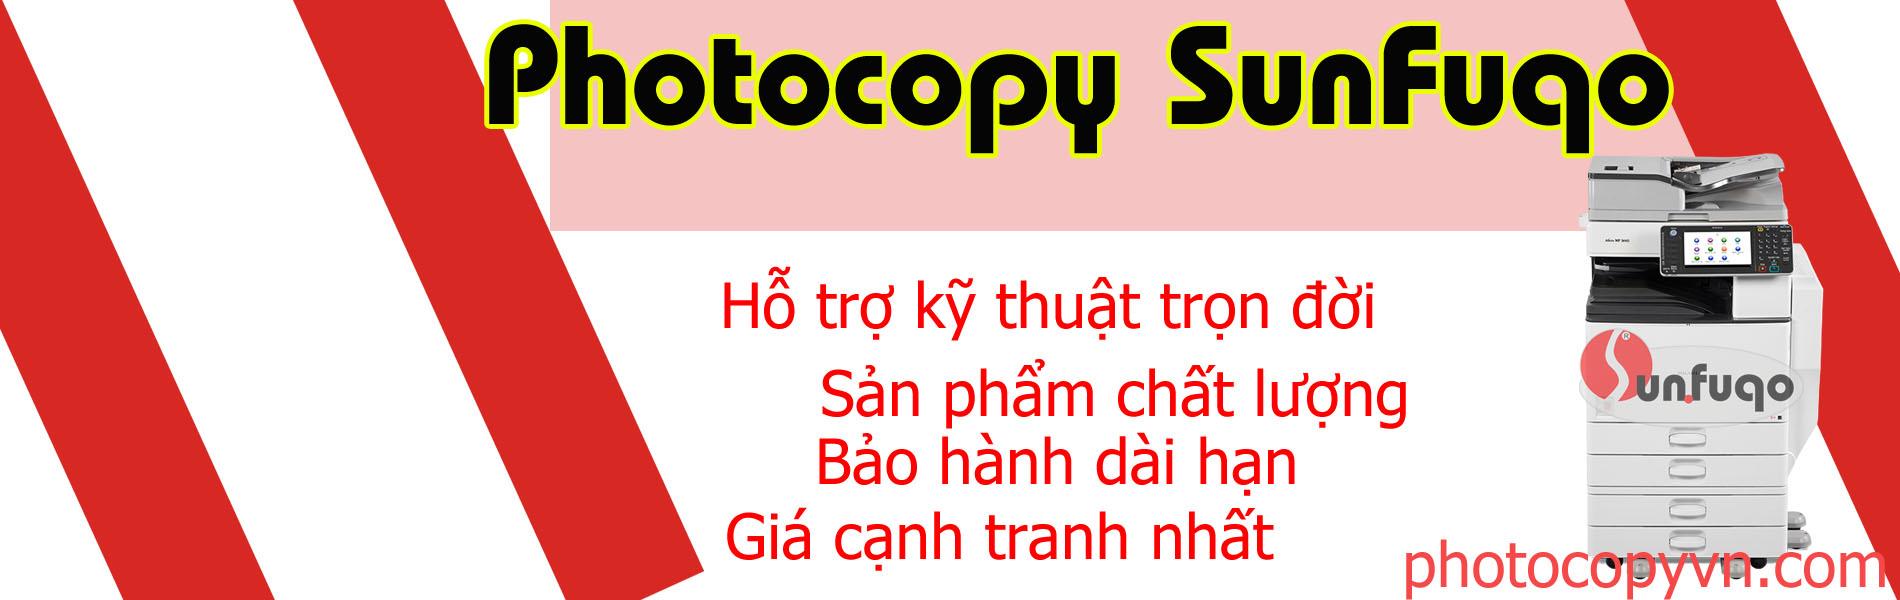 Banner-SunFuqo-may-photocopy